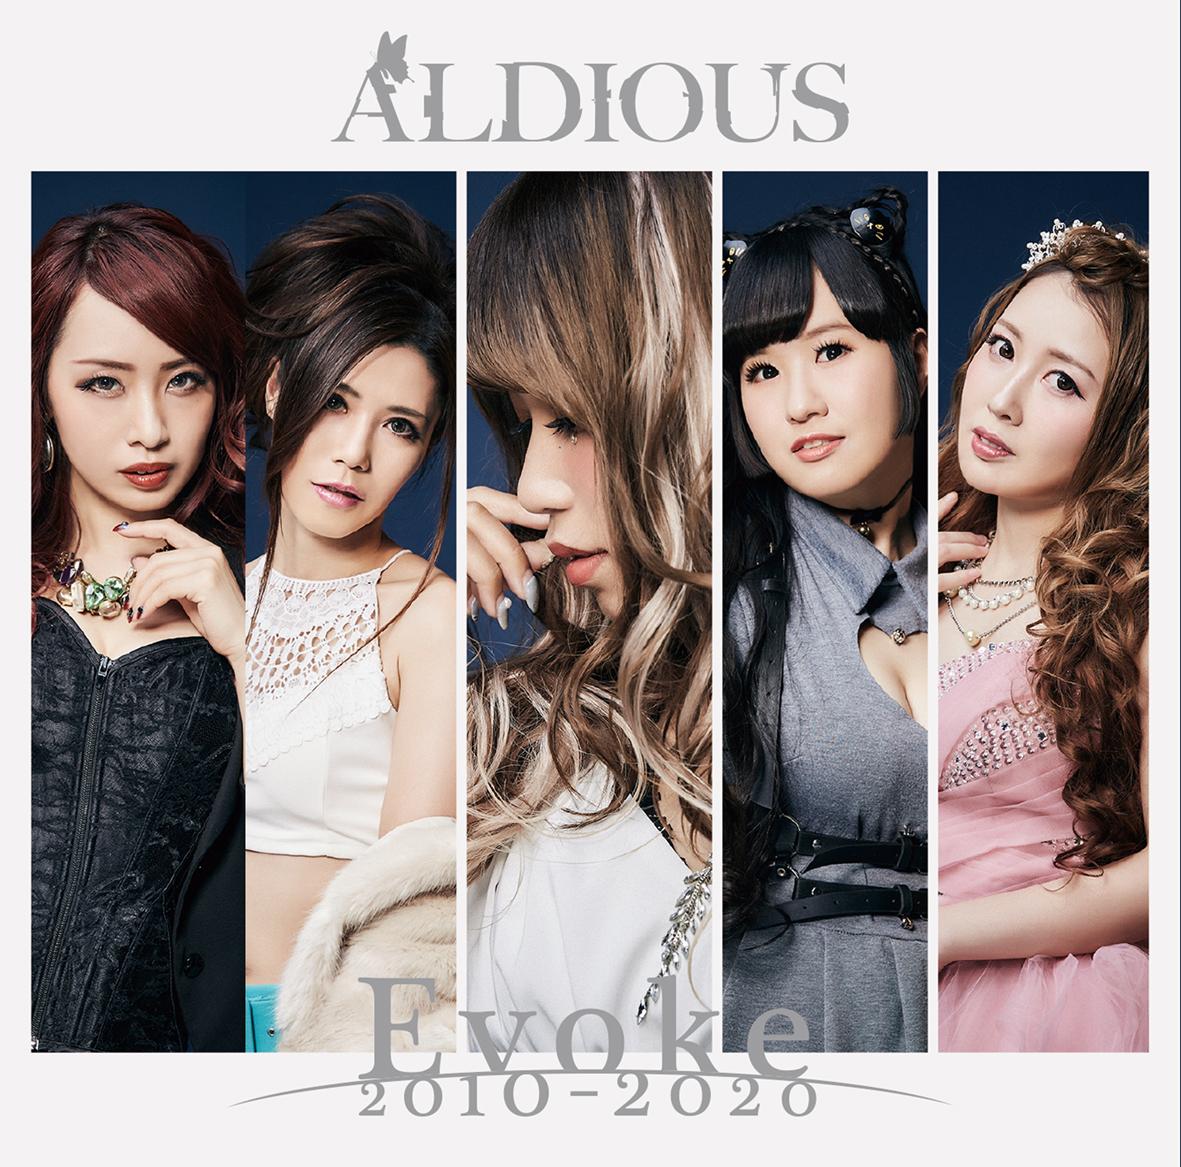 Aldious Evoke 2010-2020